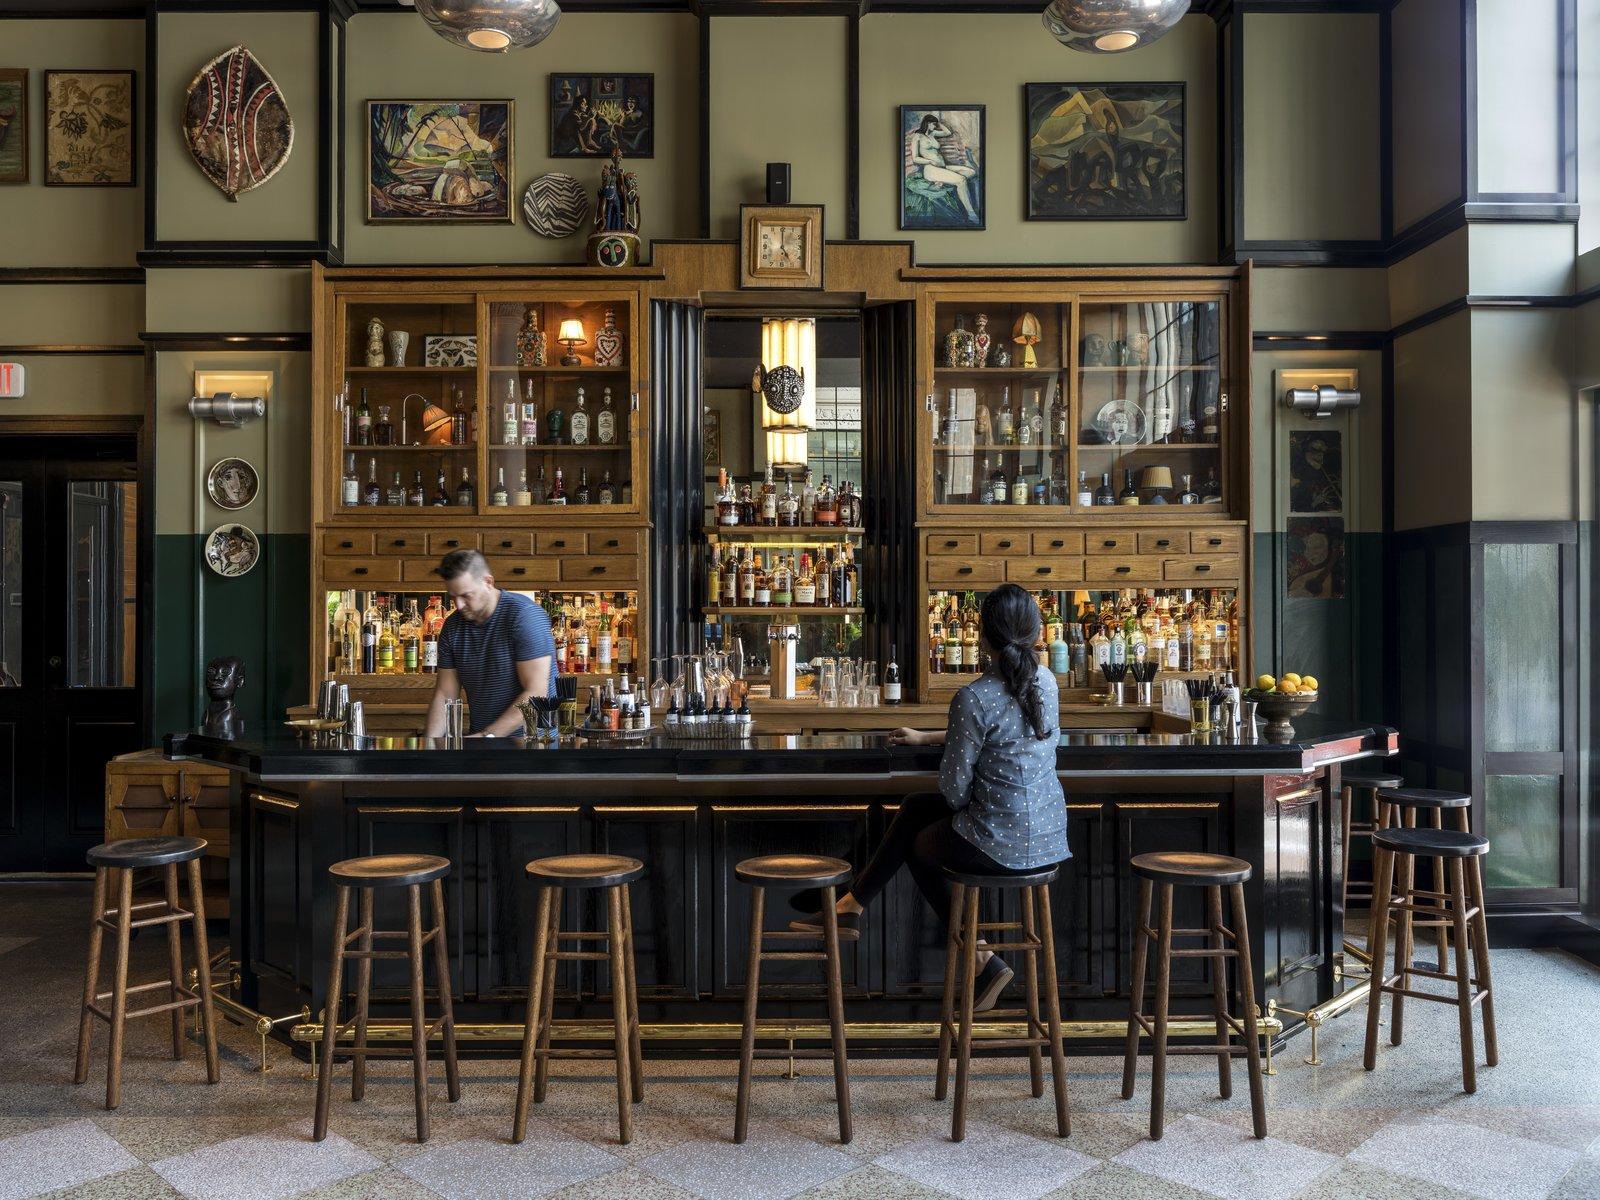 #acehotel #neworleans #louisiana #hospitality #classic #modern  Photo courtesy of Ace Hotel, New Orleans  Ace Hotel, New Orleans